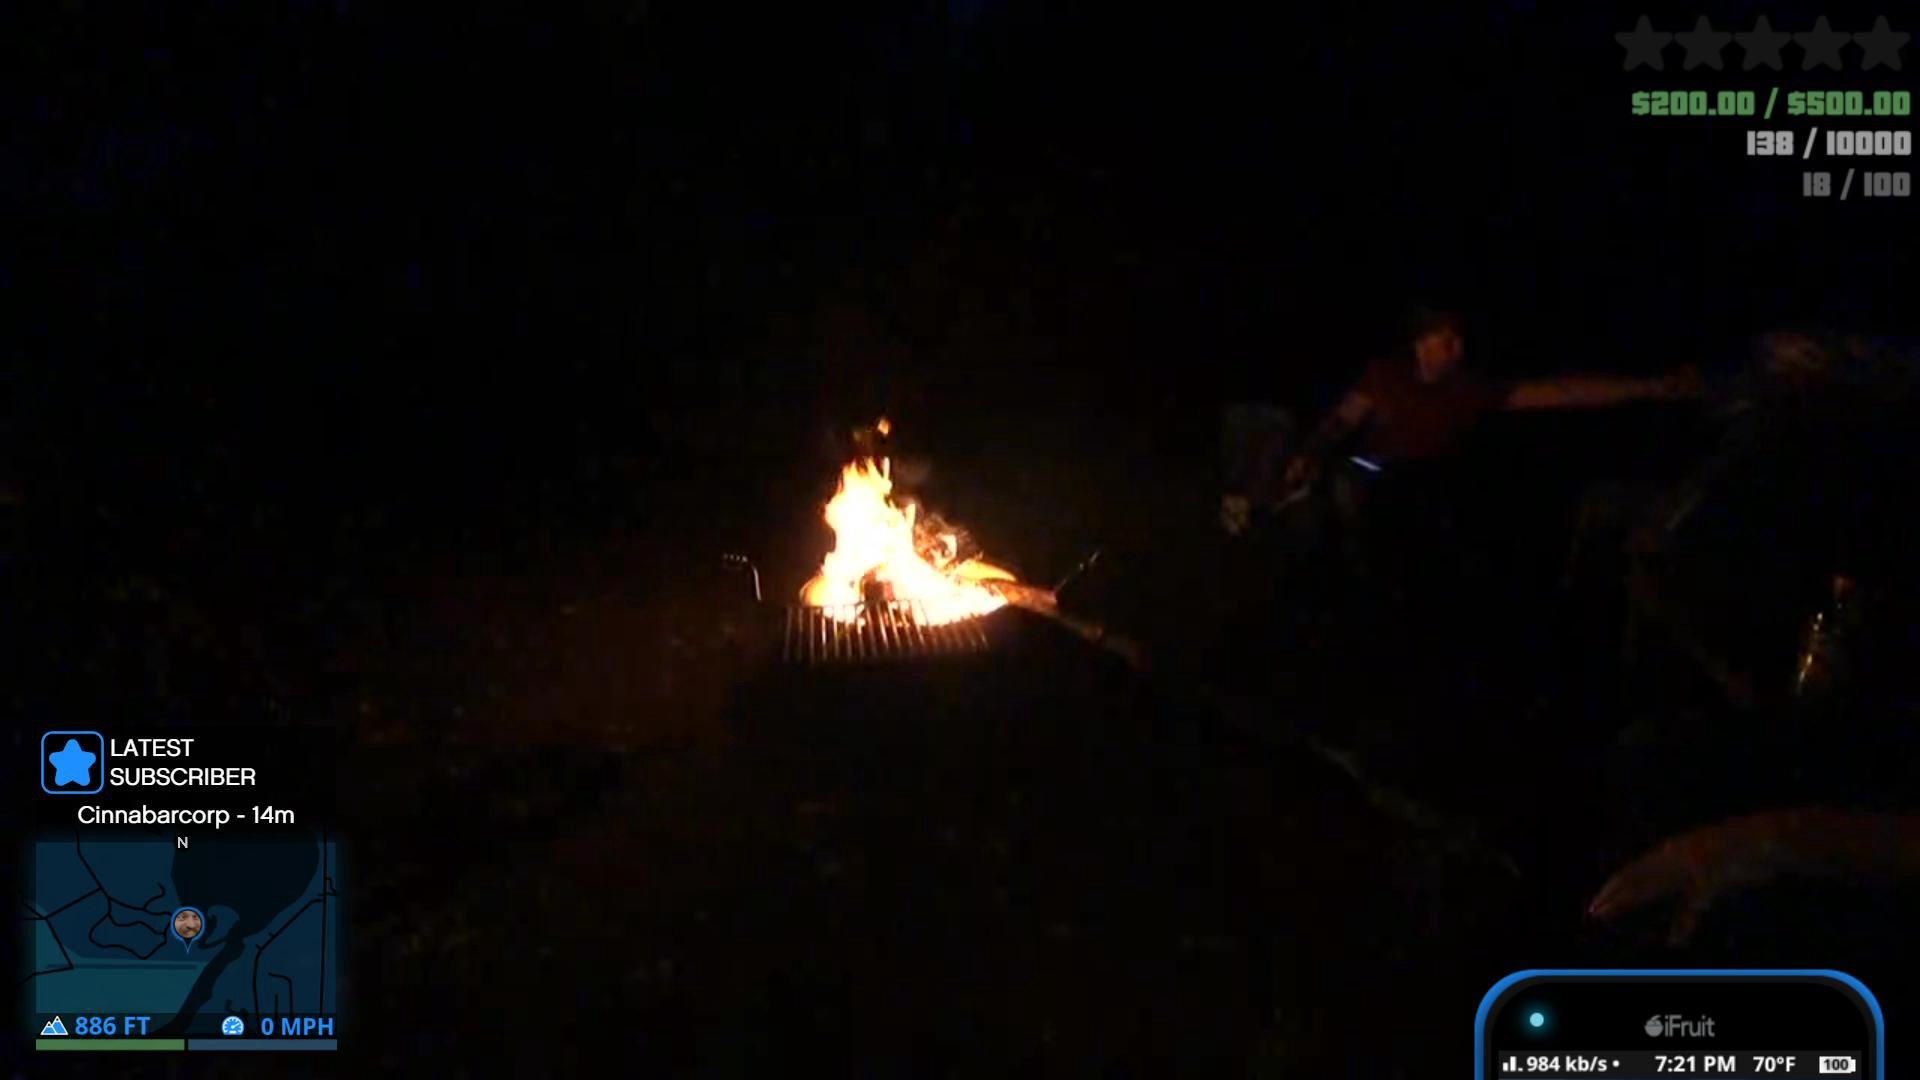 fire-fire-travel-outdoors-0300-https-t-co-cjmqhqwcer-https-t-co-makredxc1z